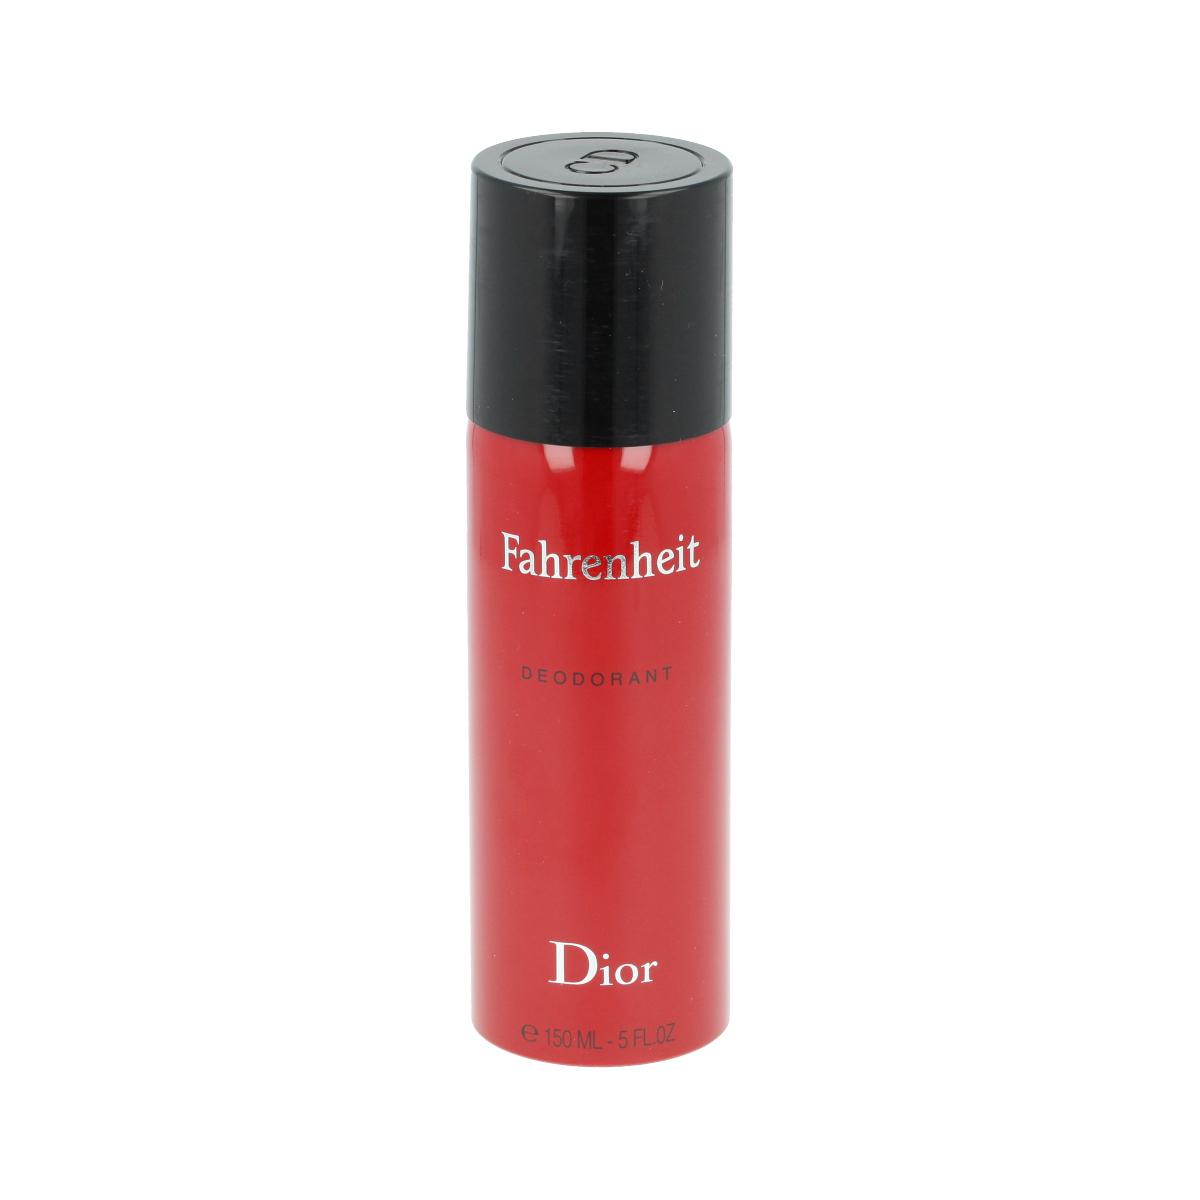 Dior Christian Fahrenheit Deodorant im Spray 150 ml (man) 25188